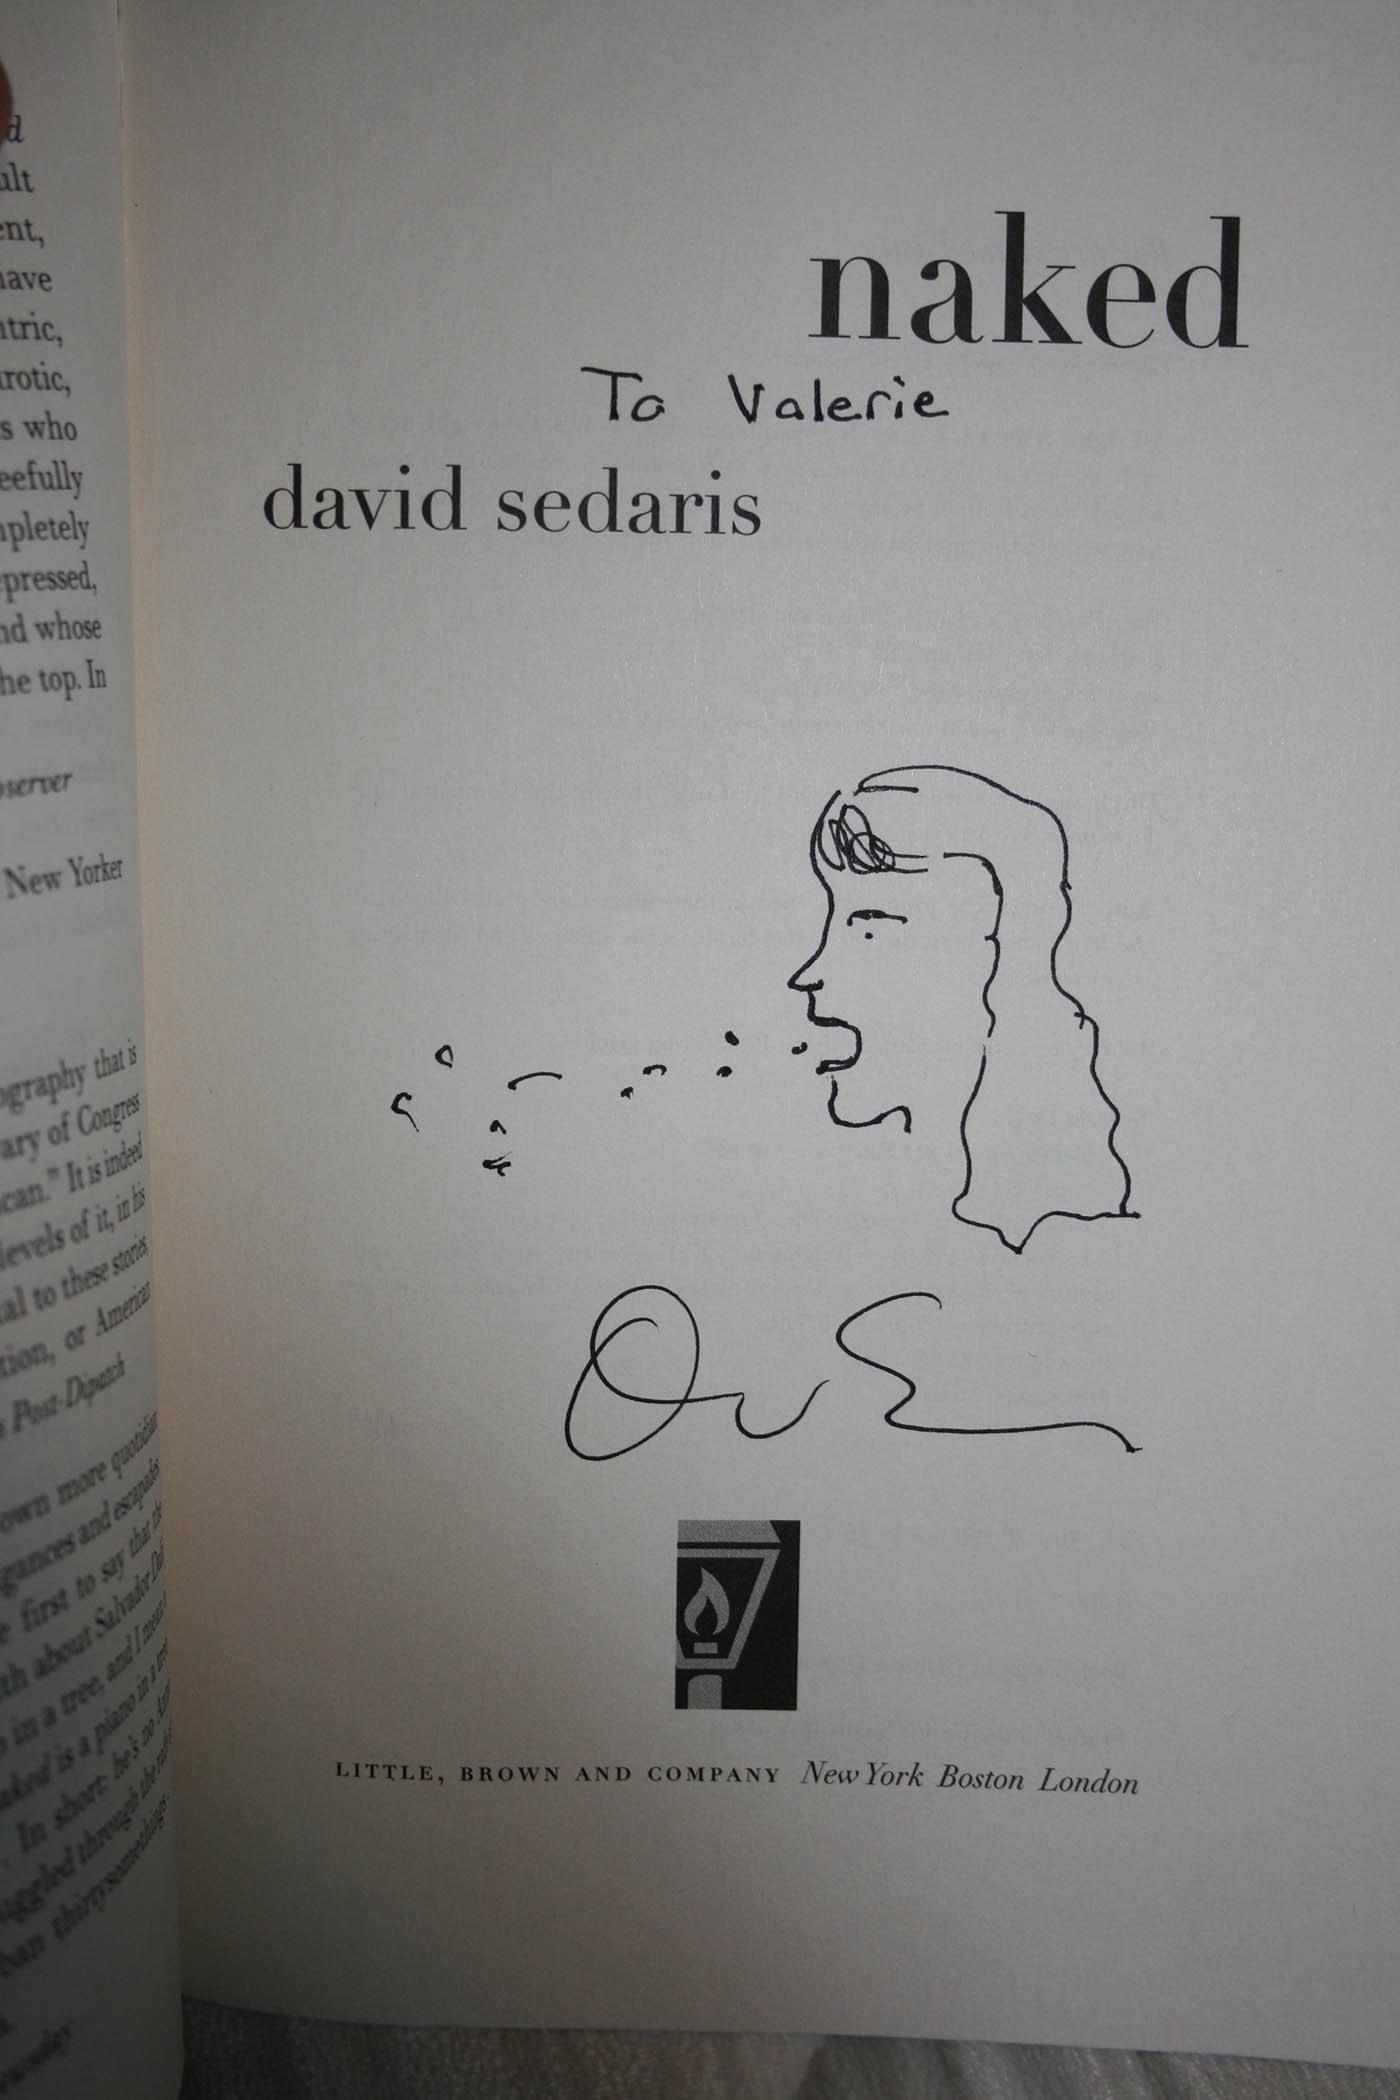 David Sedaris at Steppenwolf in Chicago. A drawing by David Sedaris of me vomiting.